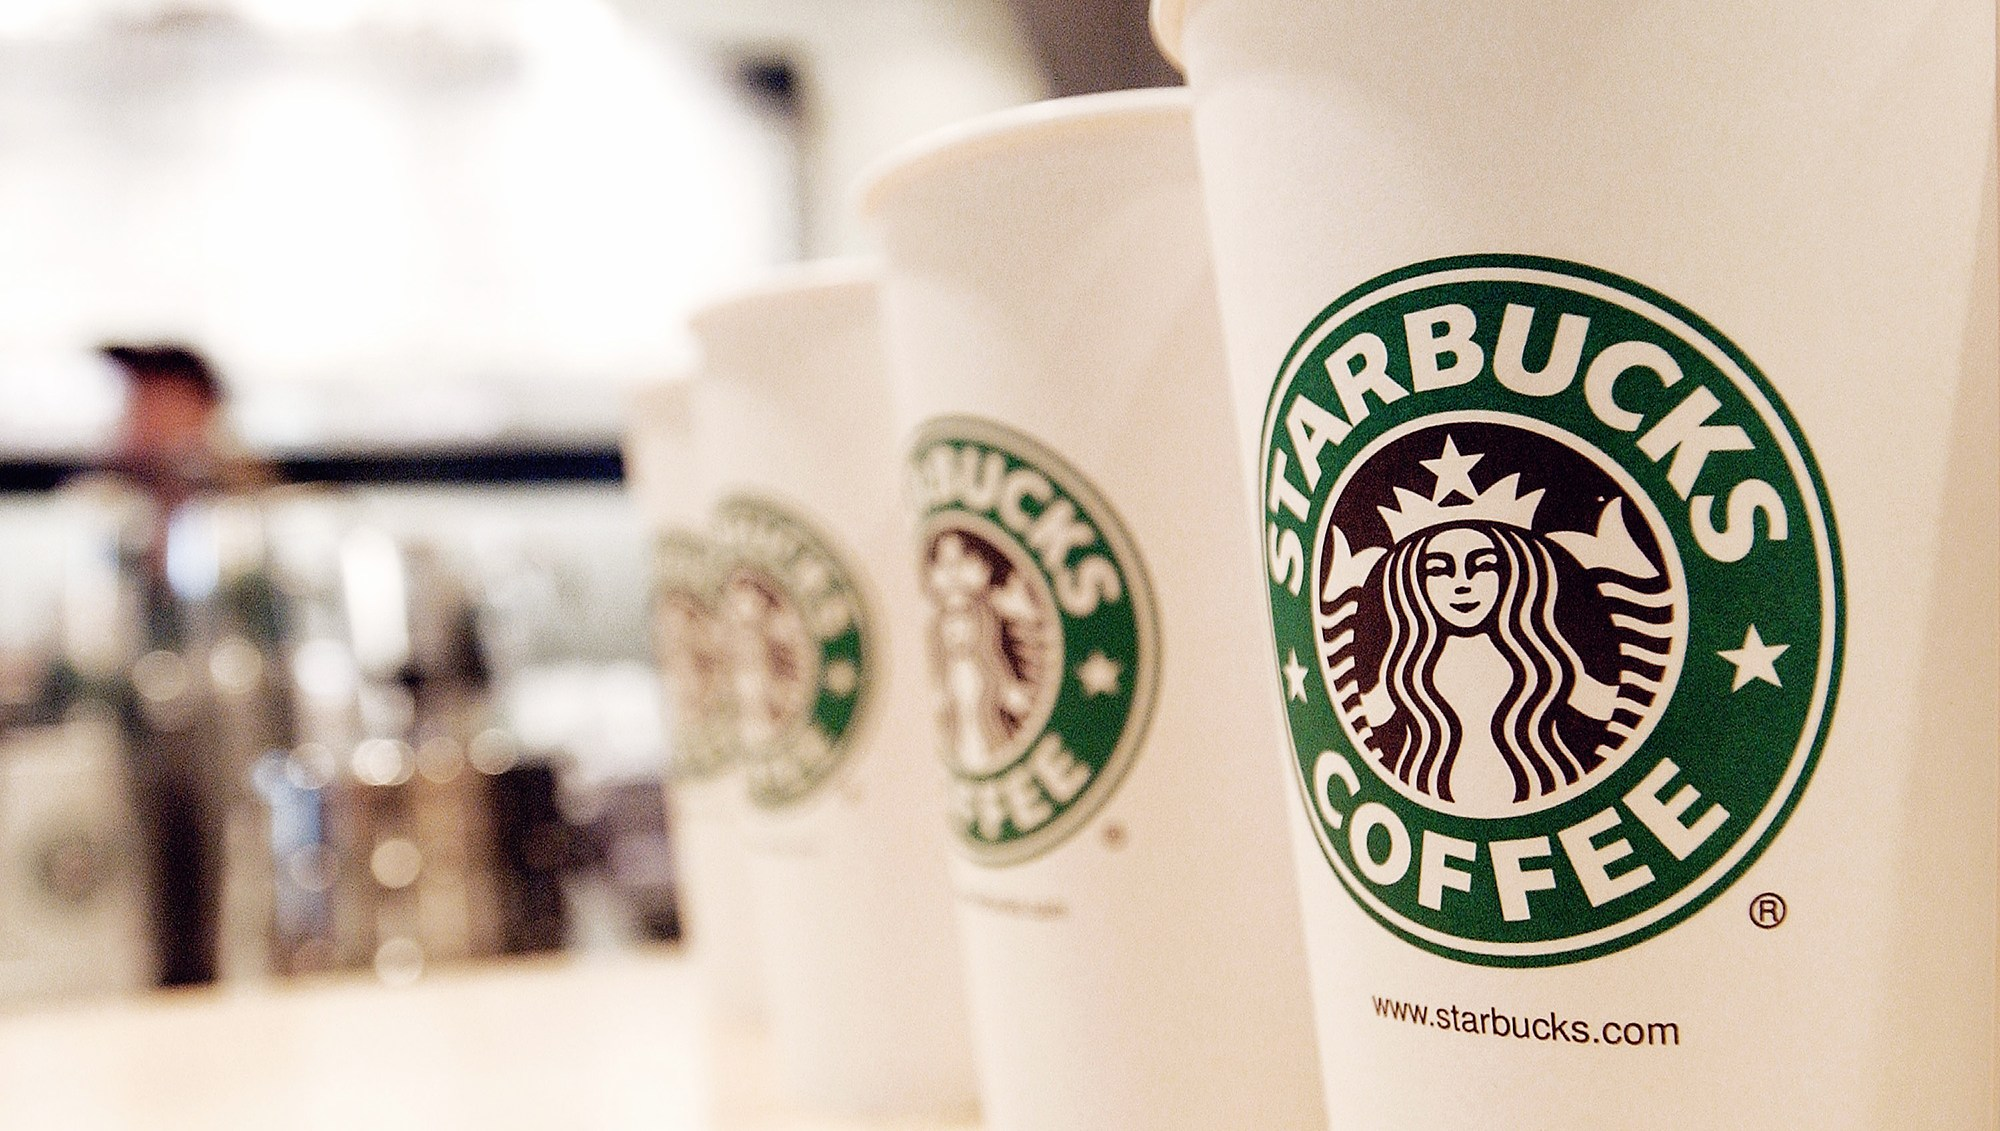 Starbucks Barista Fired